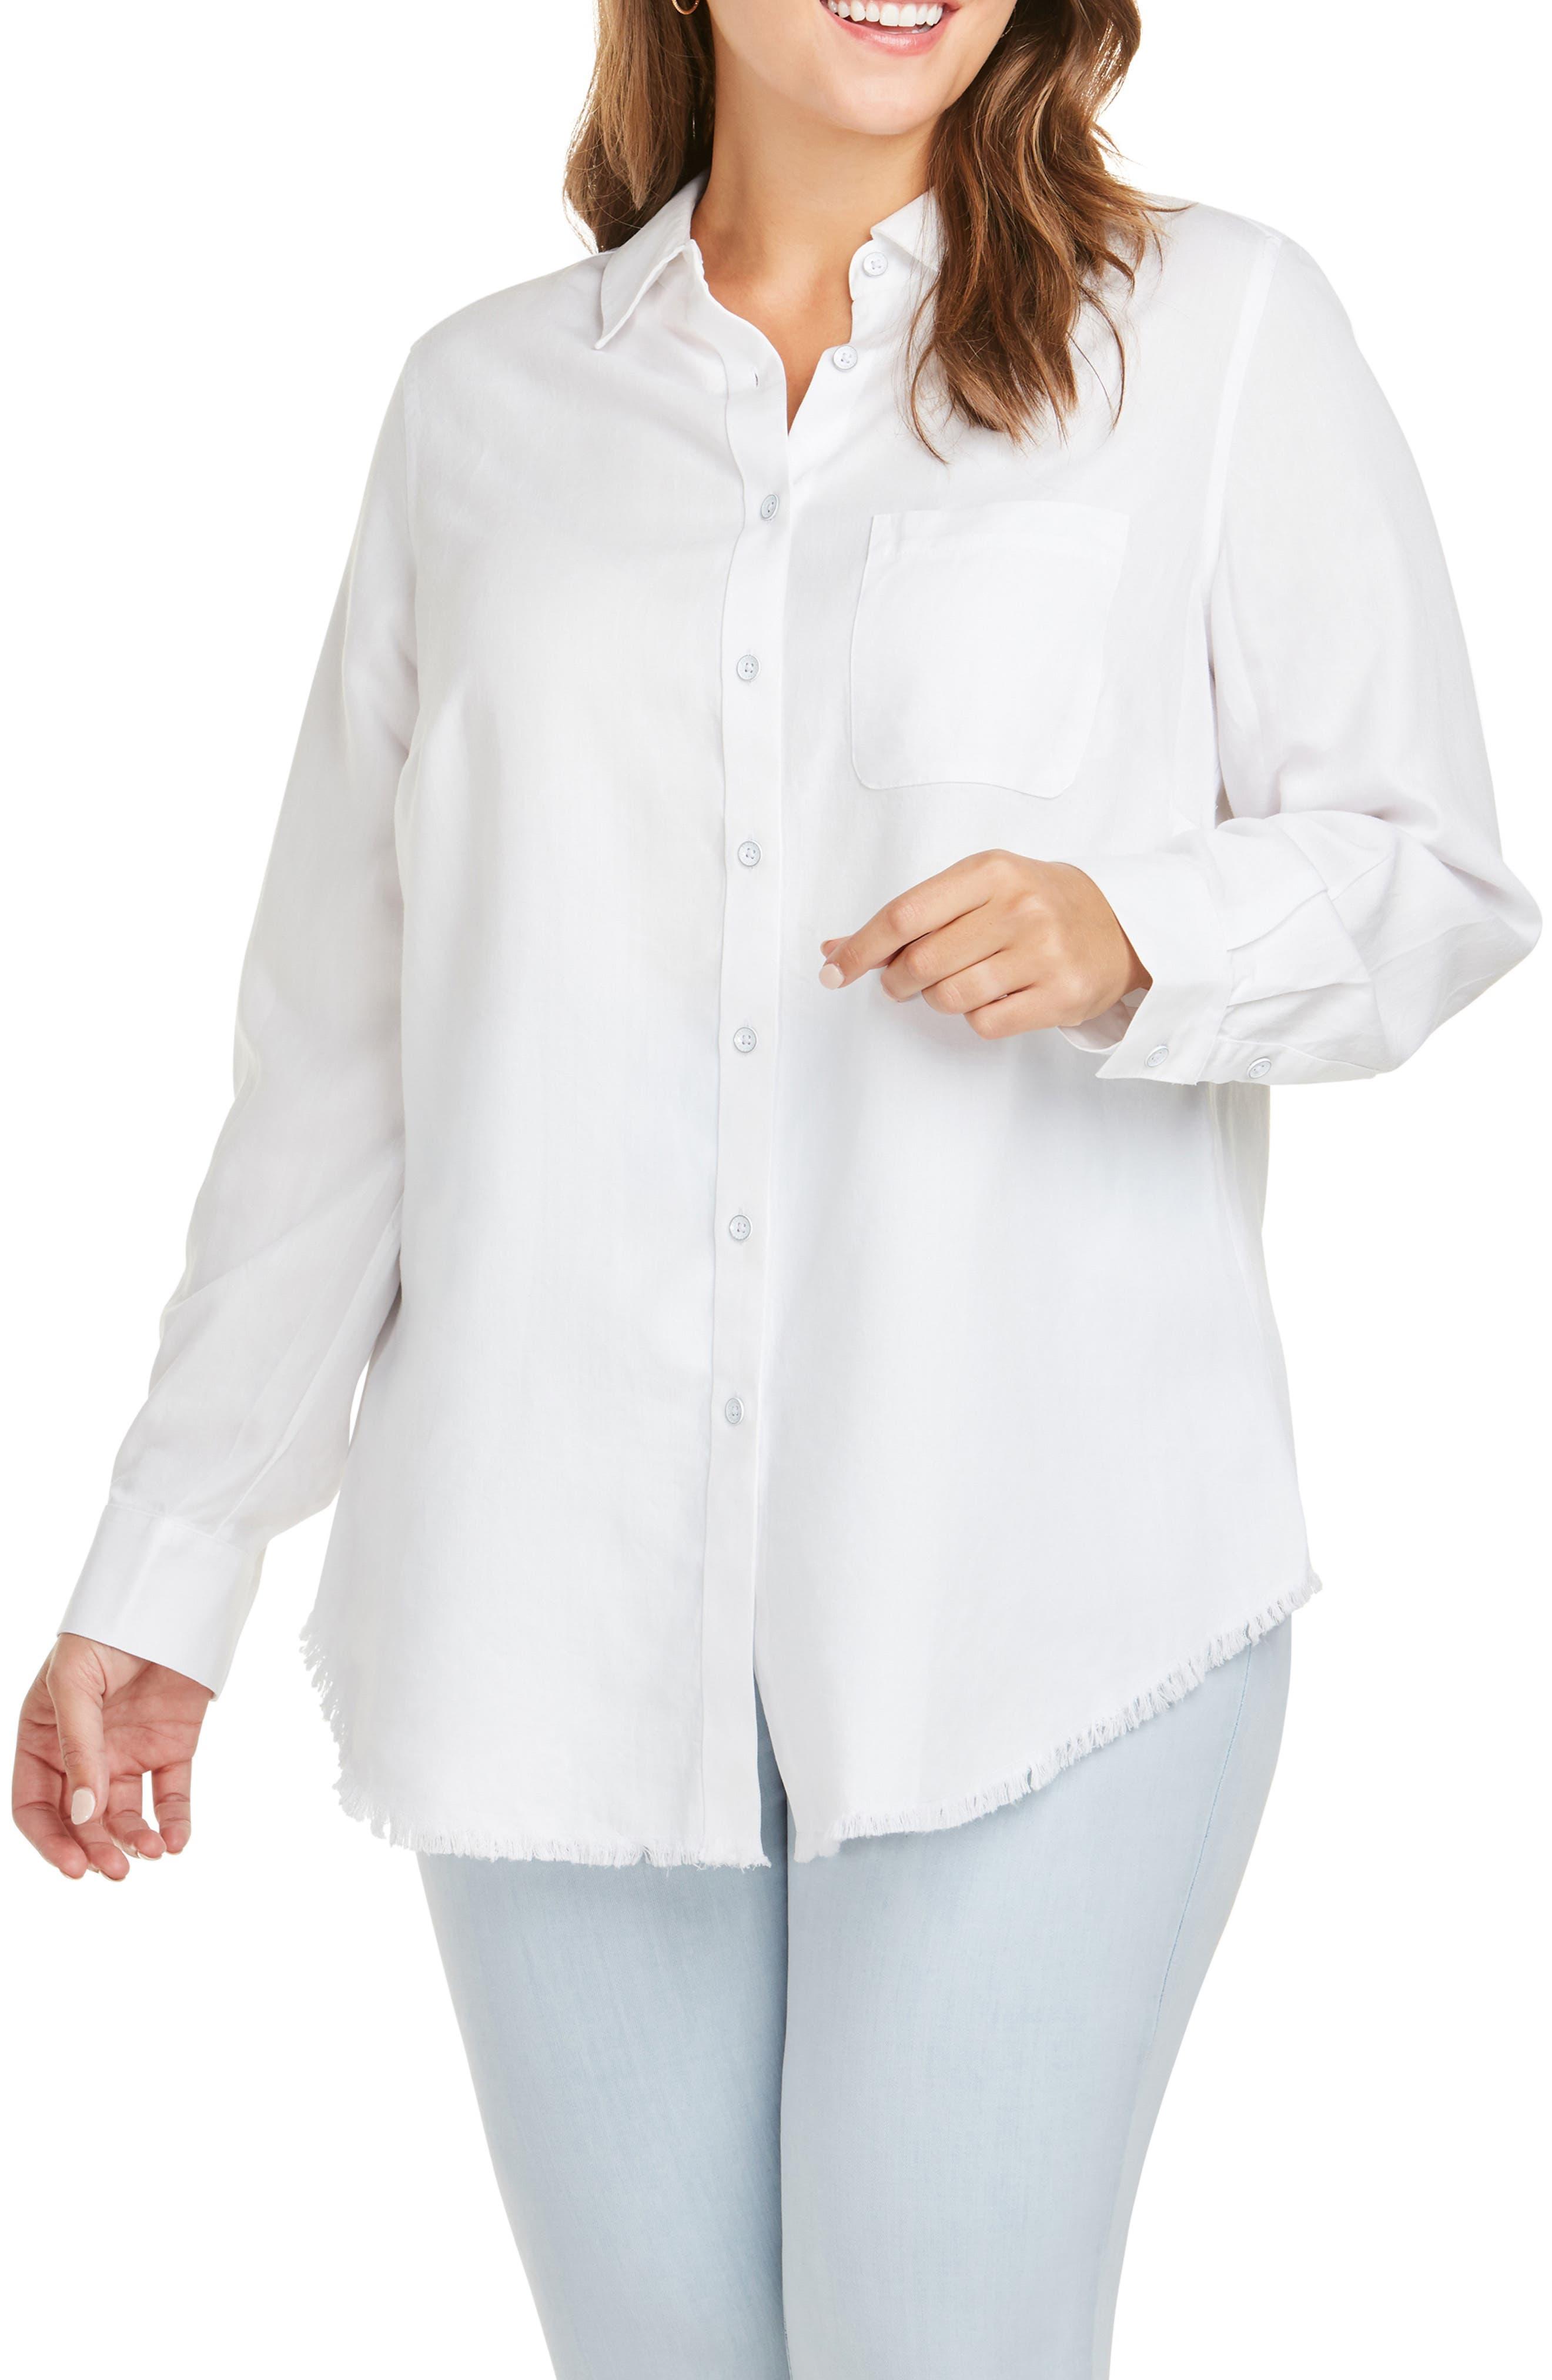 Haven Shirt,                             Main thumbnail 1, color,                             WHITE